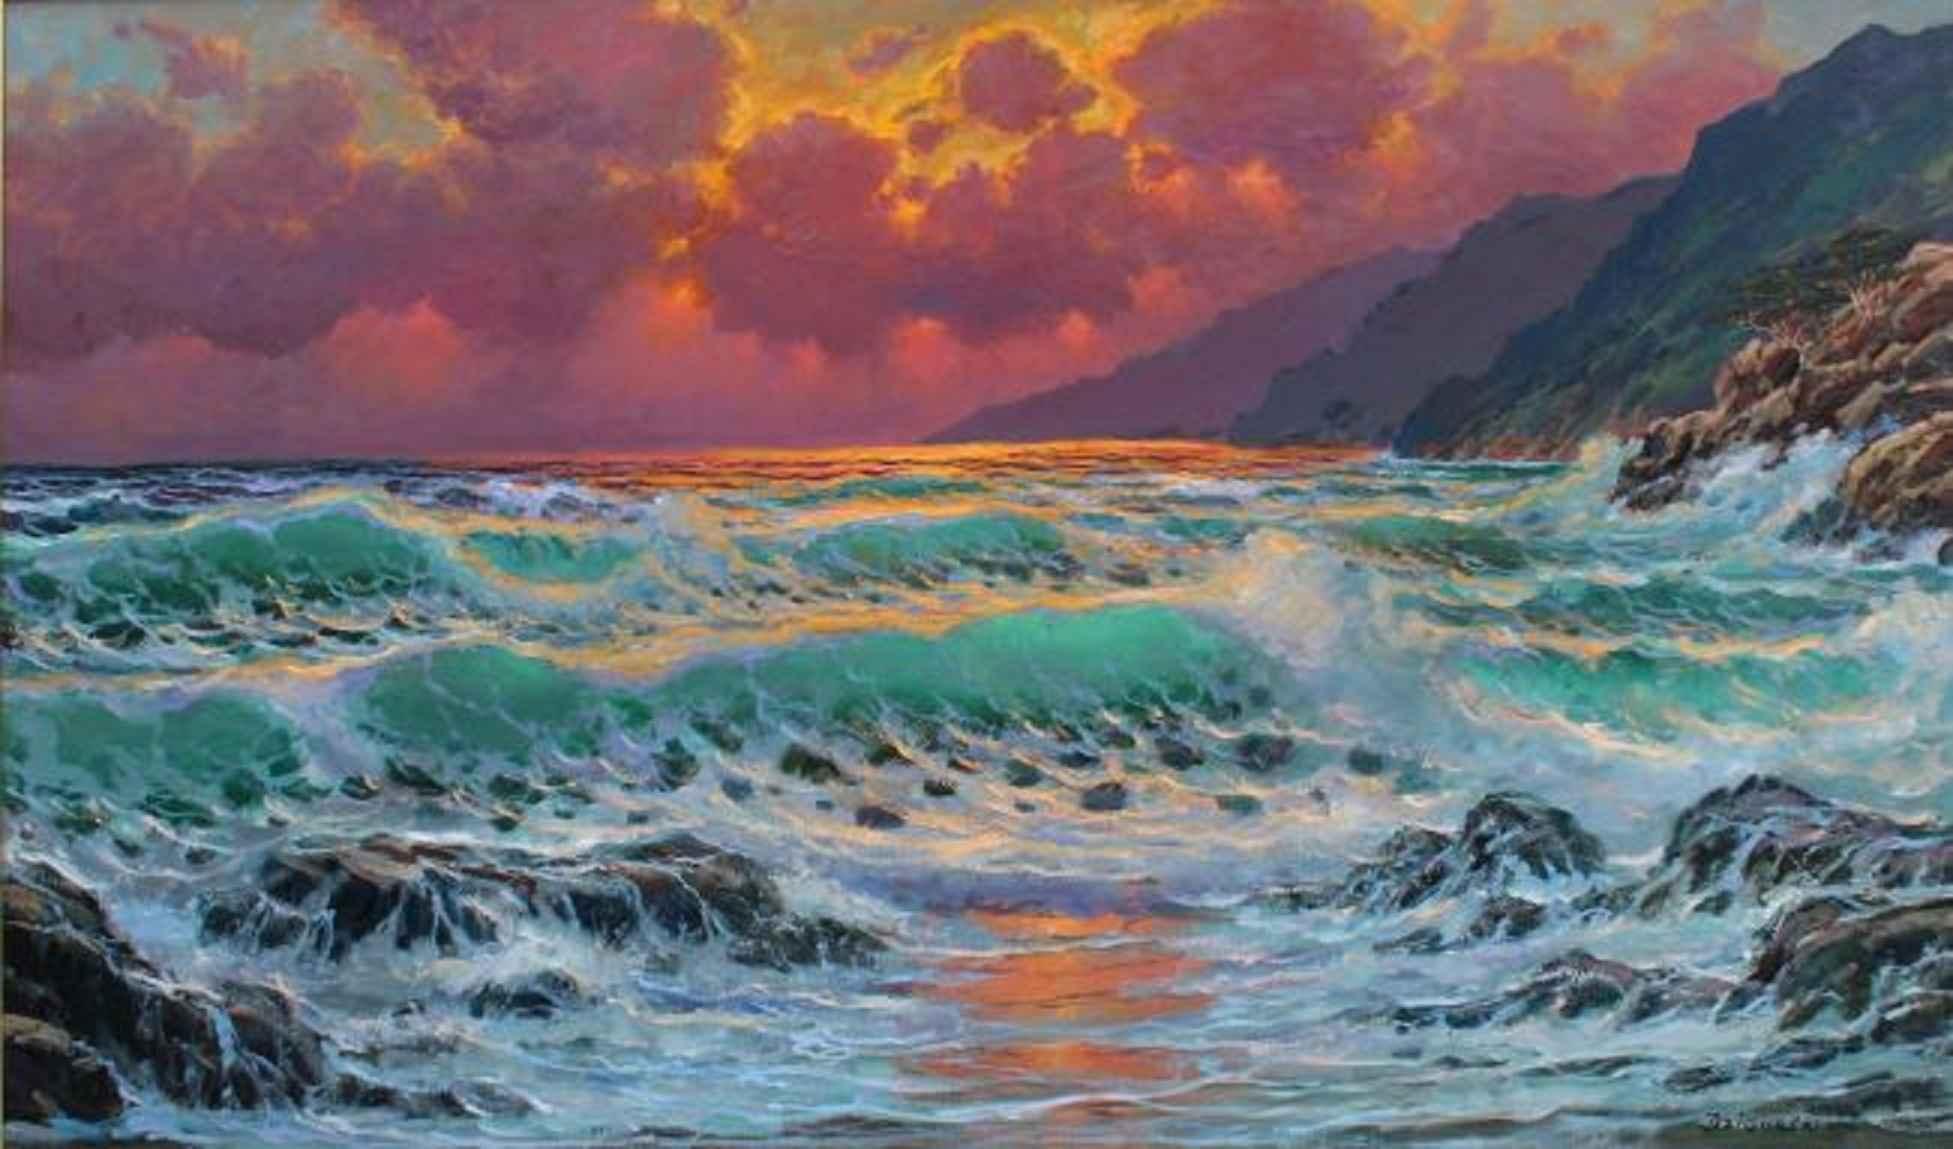 Pacific Symphony, Big... by  A Dzigurski II - Masterpiece Online